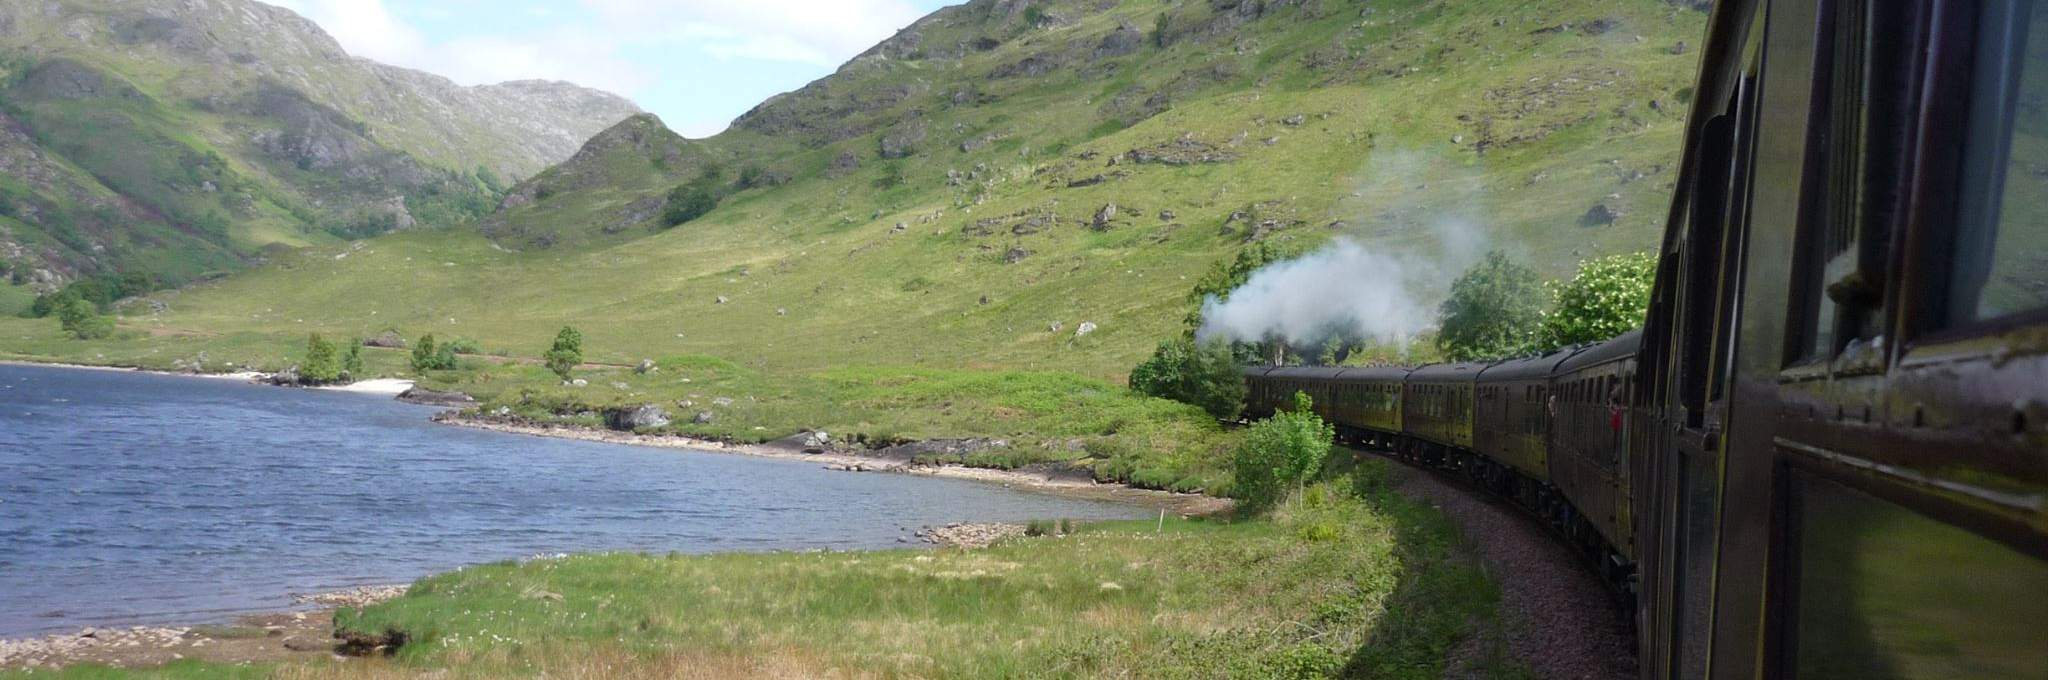 Discover Scotland by Train